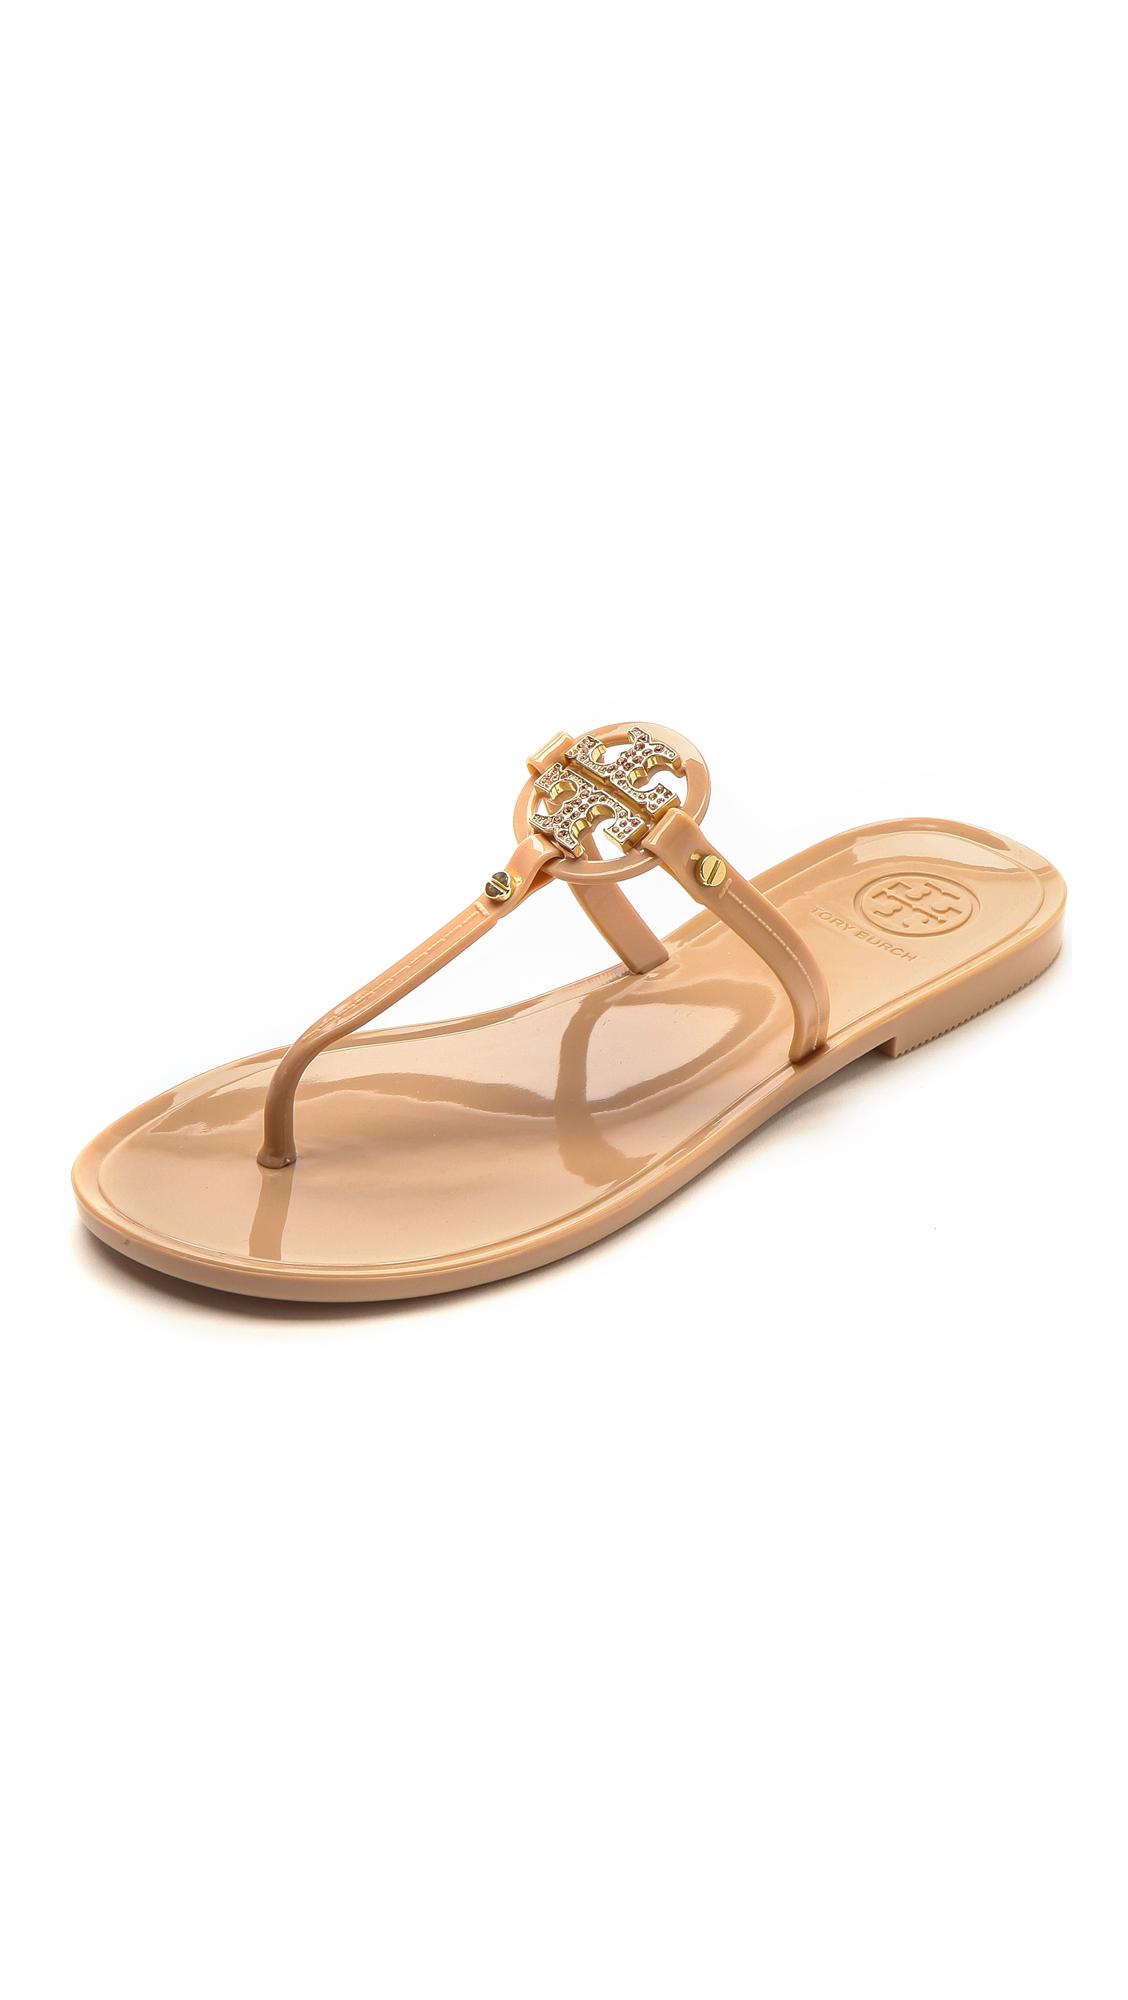 041b120ba9c1 Lyst - Tory Burch Mini Miller Flat Thong Sandals - Blush in Pink